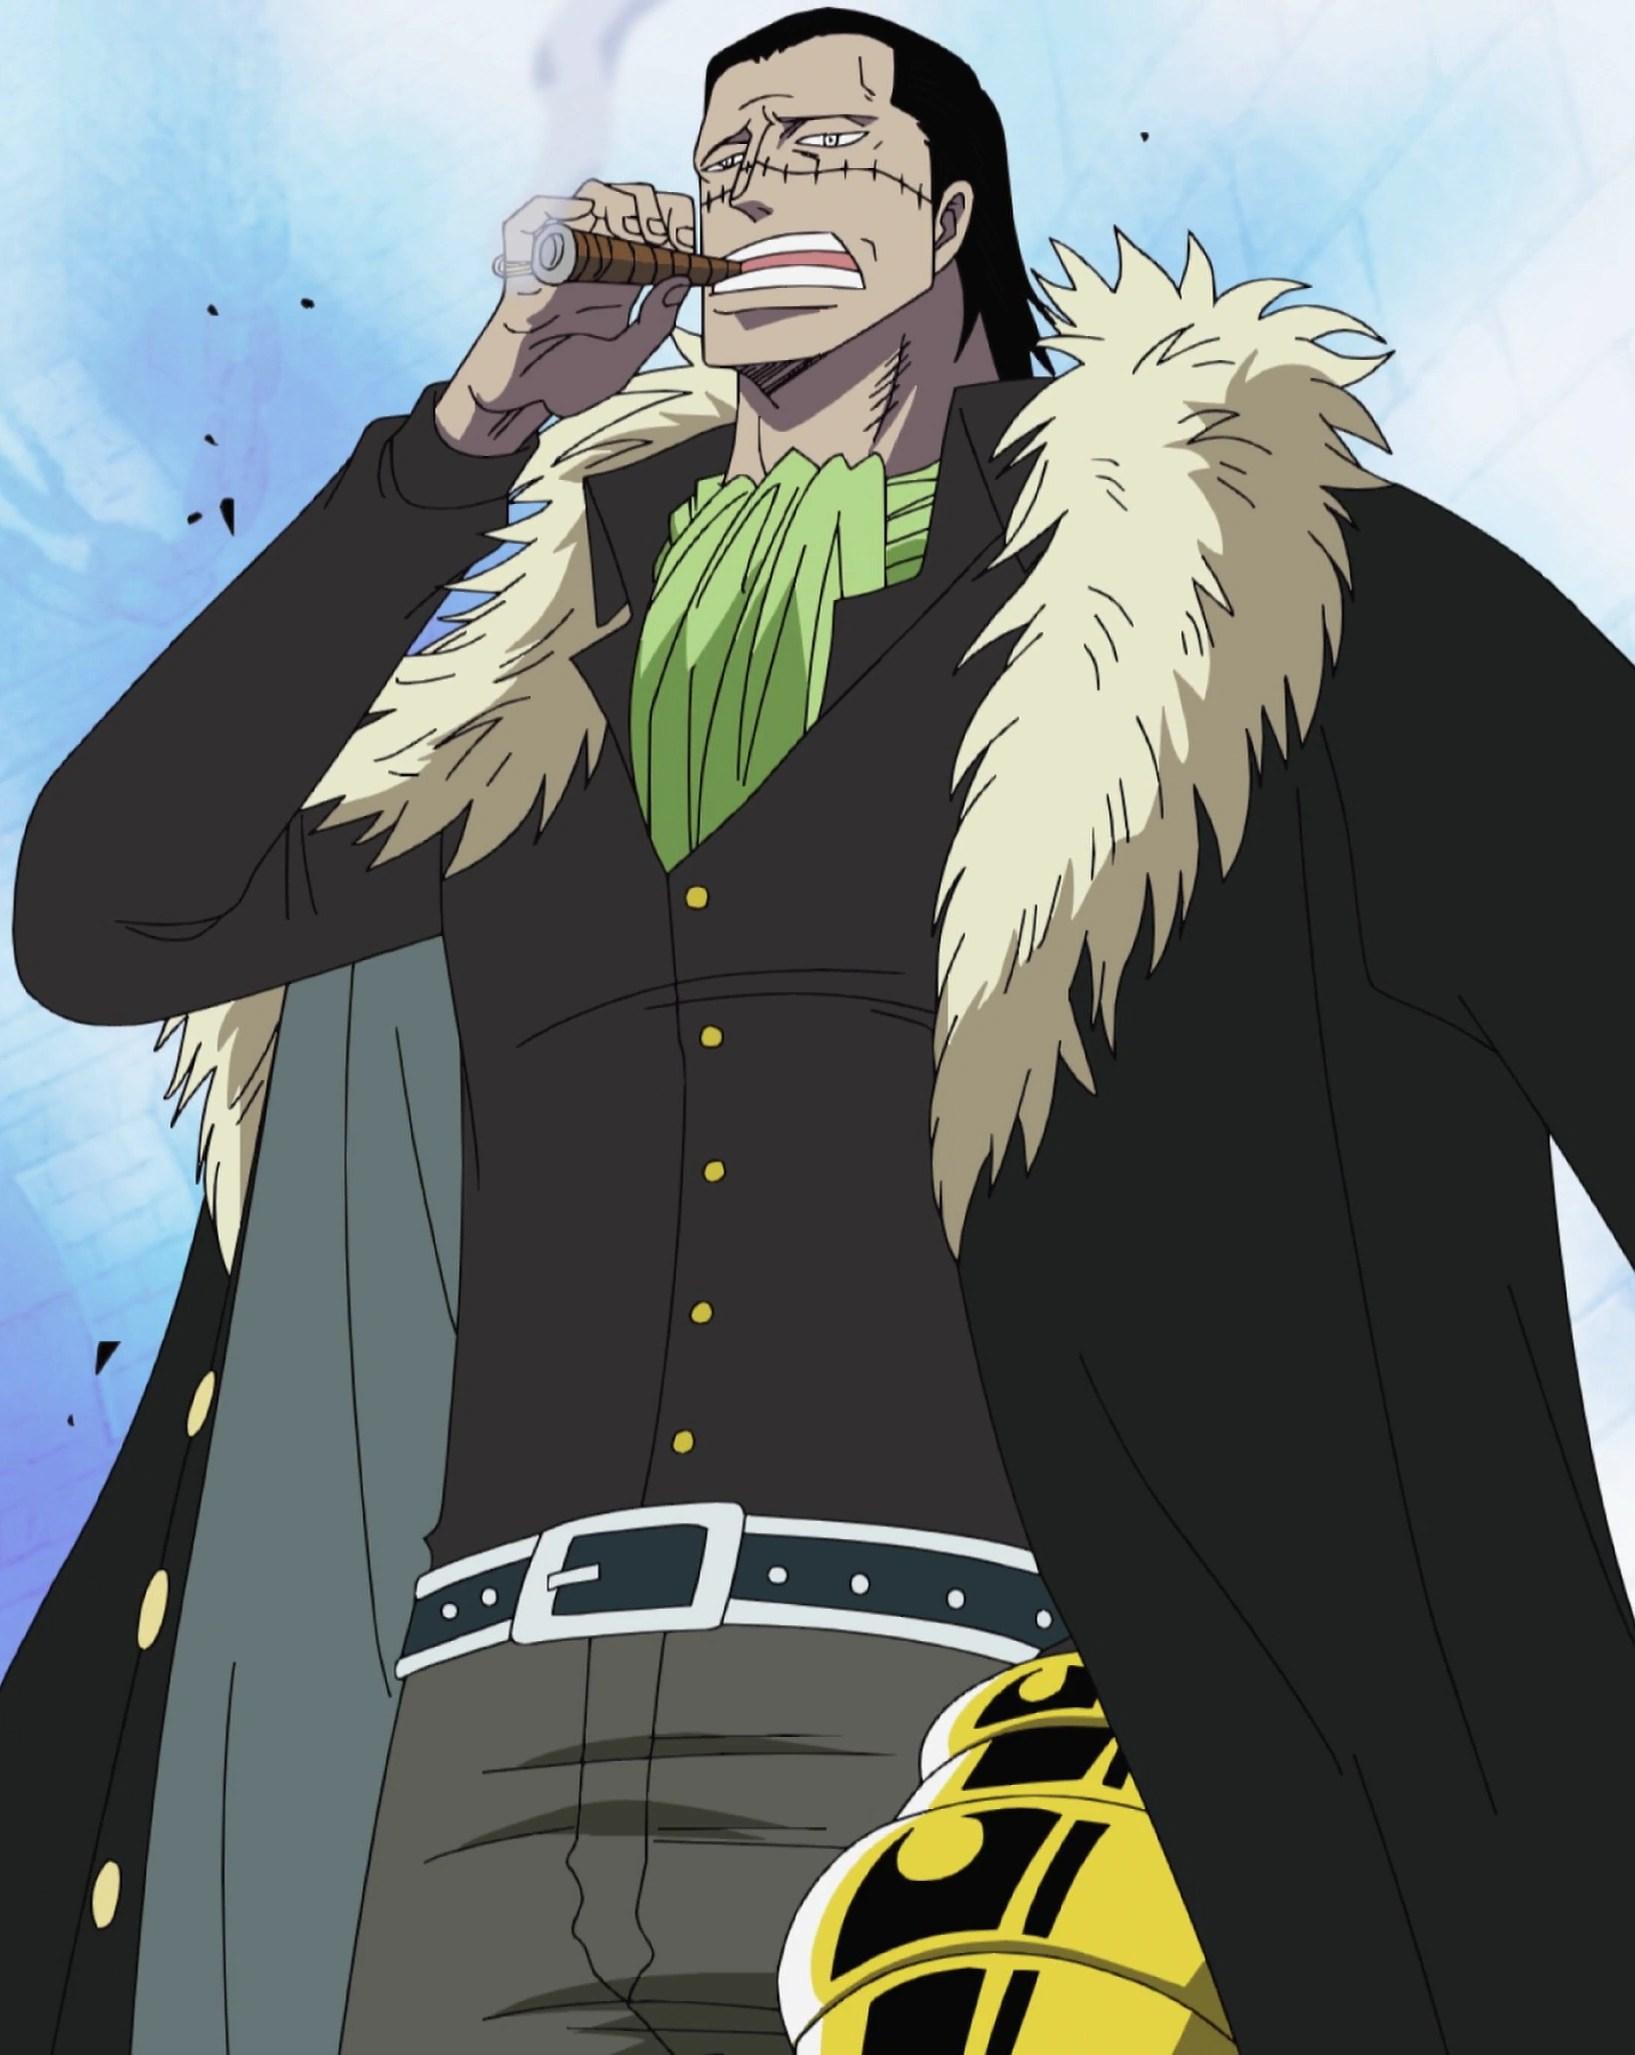 Episode Luffy Menggunakan Haki Di Marineford : episode, luffy, menggunakan, marineford, Crocodile, Wikia, Piece, Fandom